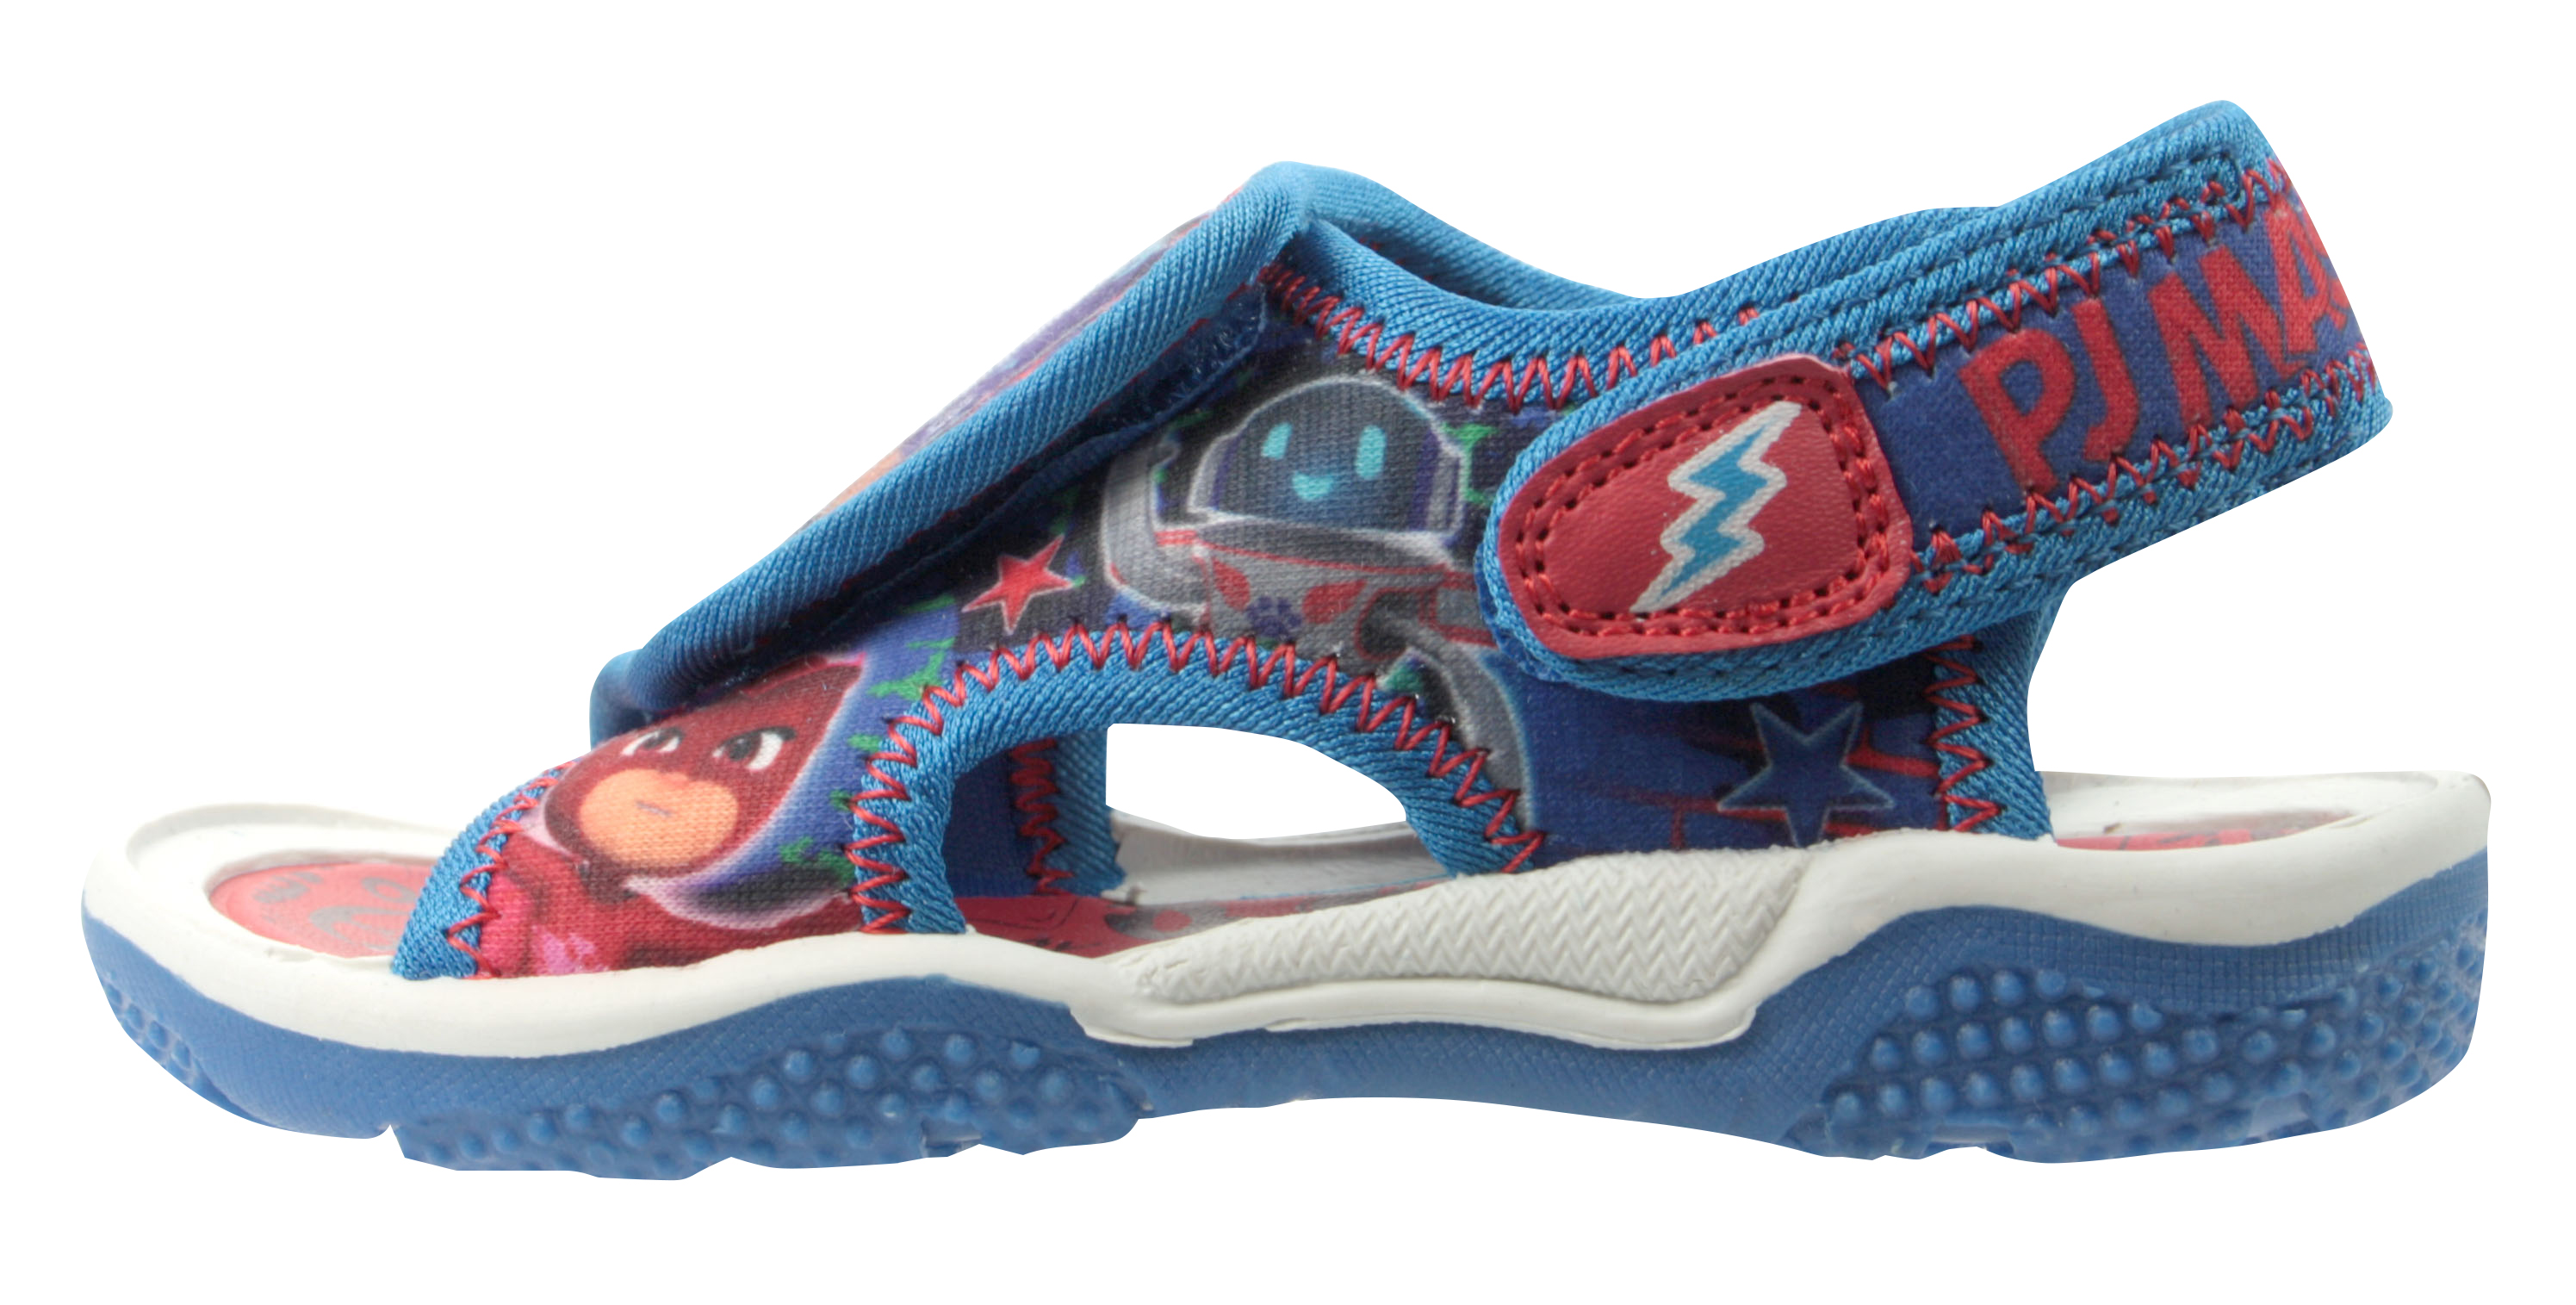 P J Masks Boys Blue Sports Beach Sandals Hook /& Loop Sizes UK 5-10